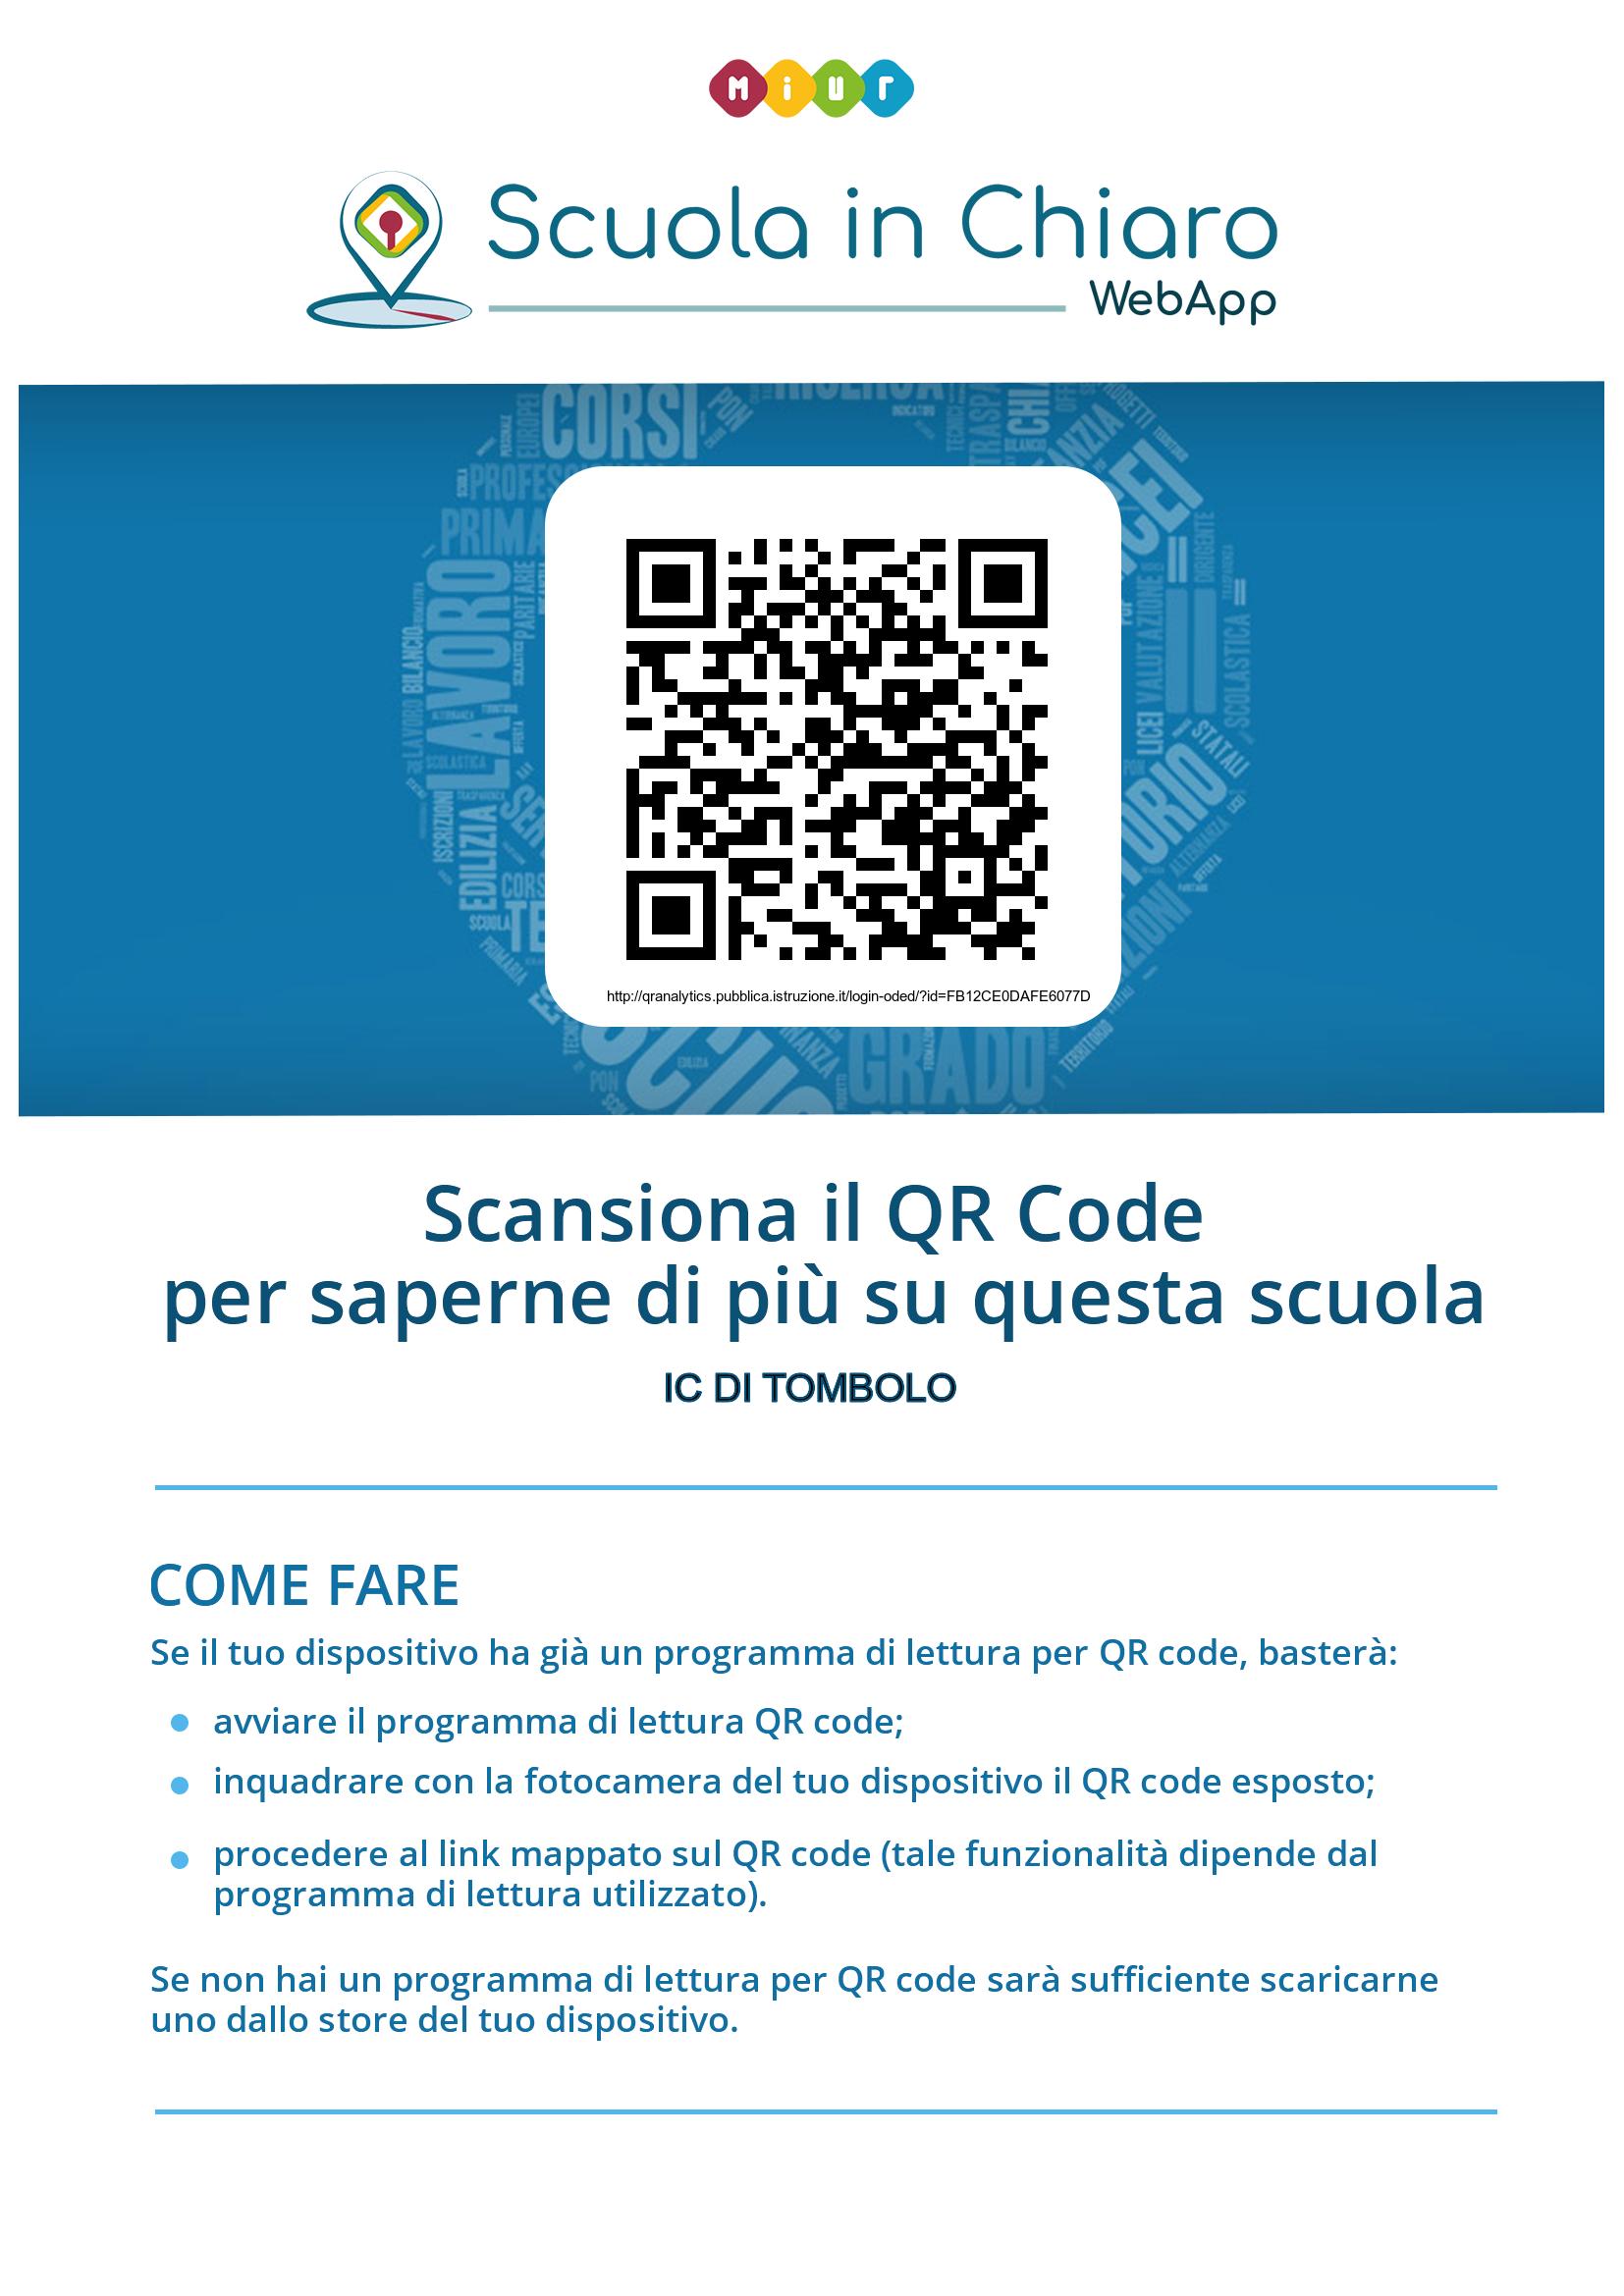 QR Code di istituto